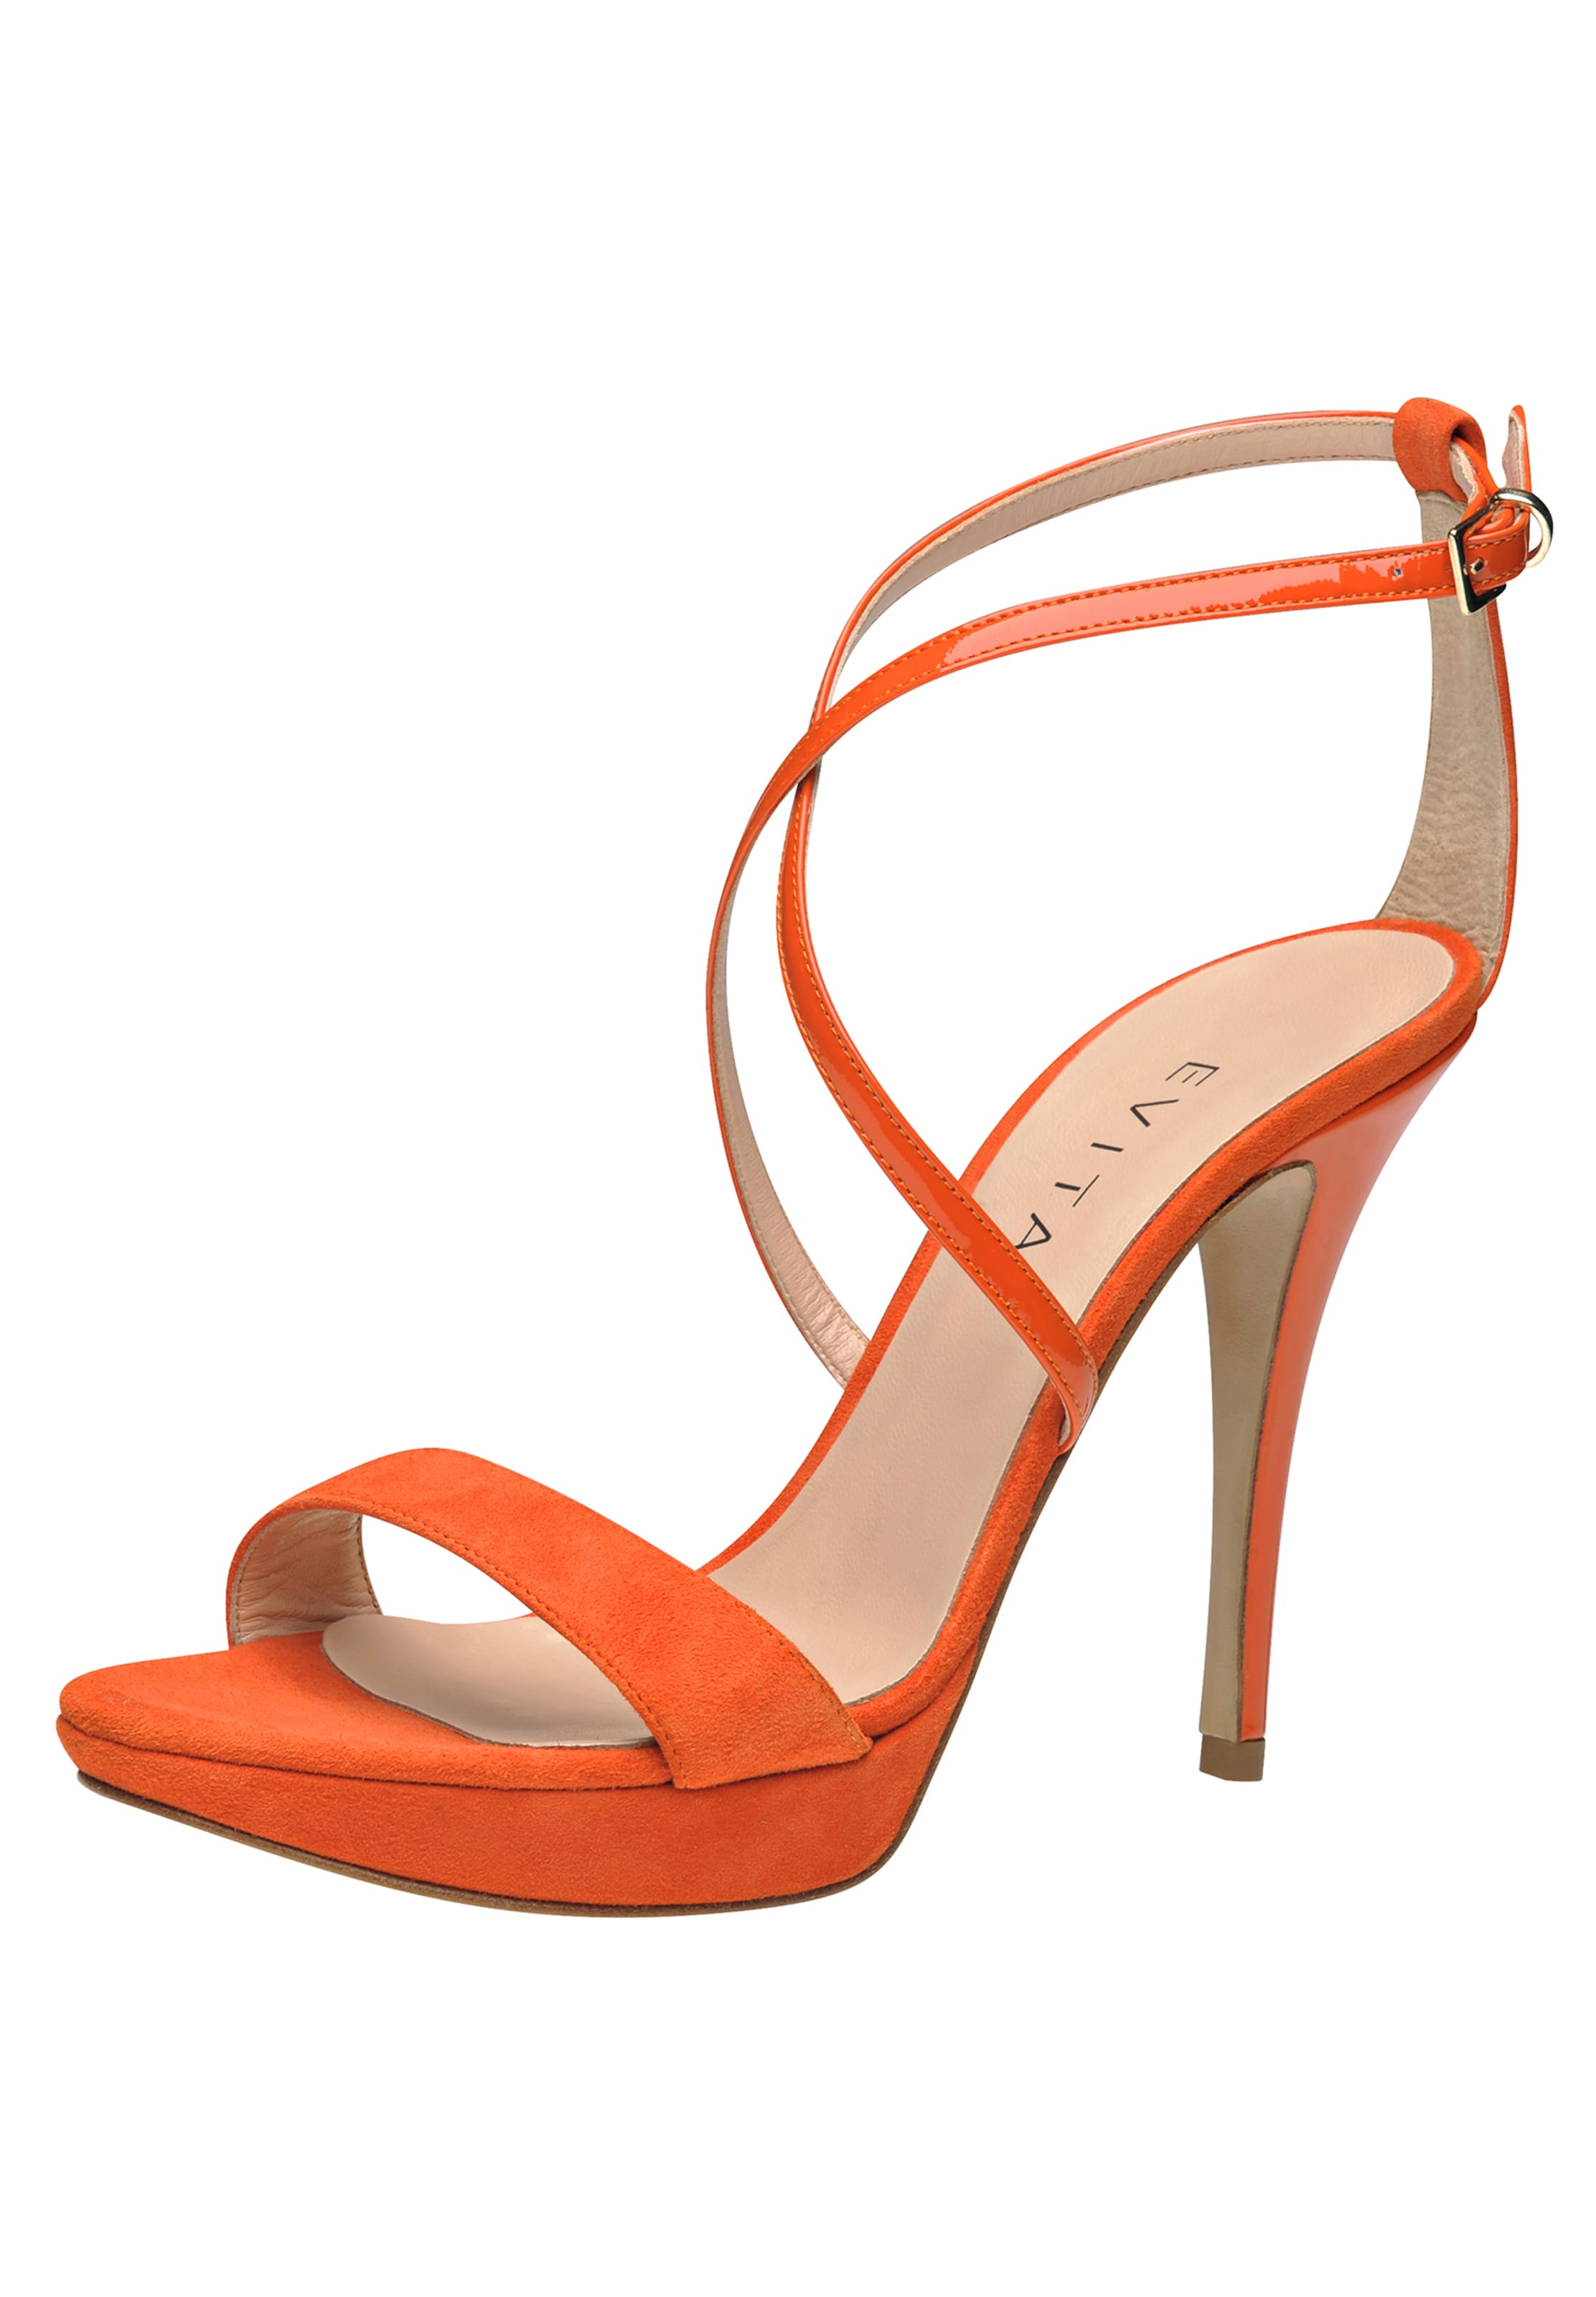 Evita Fluo Orange Arrière En Escarpins Bride À yfYv7gI6b